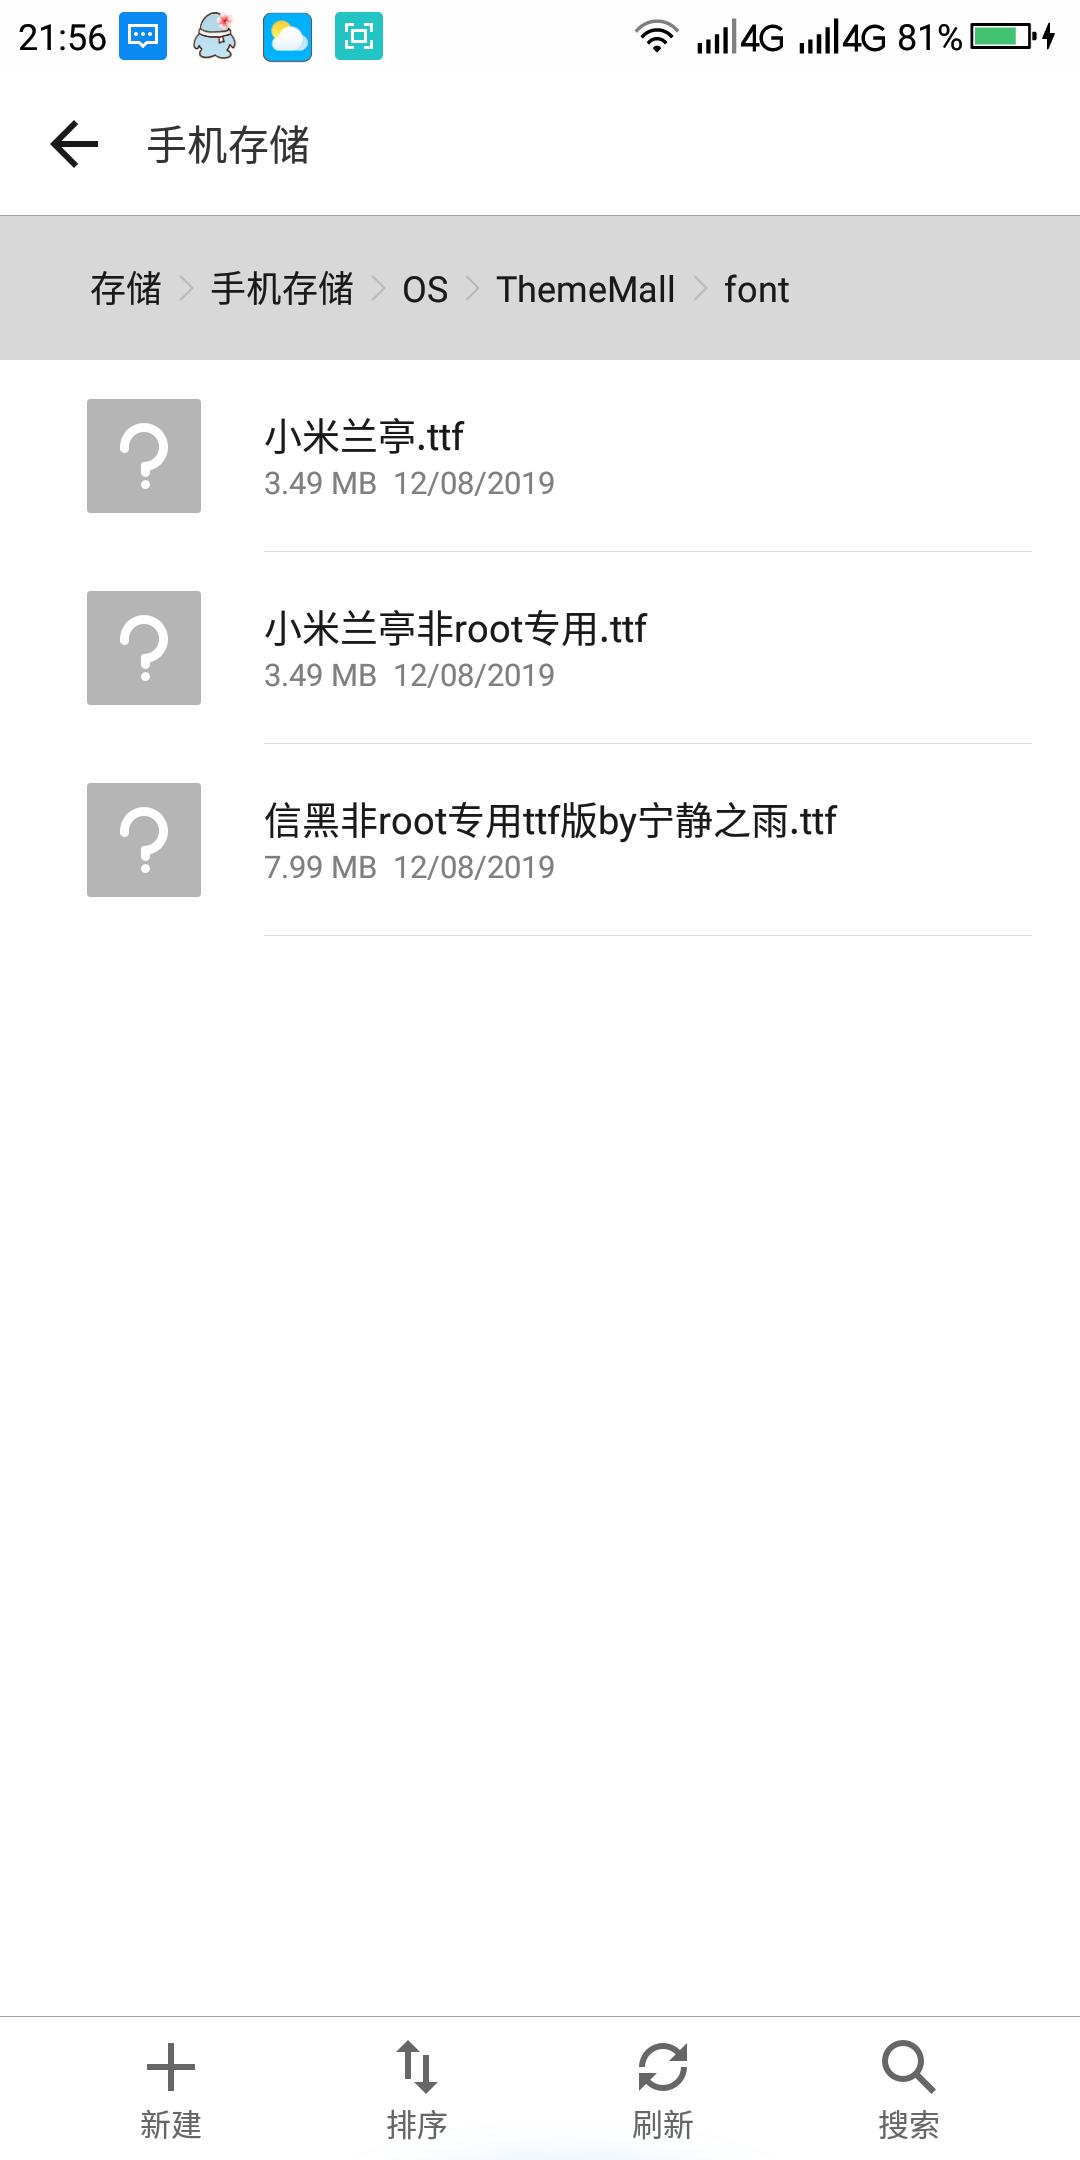 Screenshot_2019-08-12-21-56-32.png